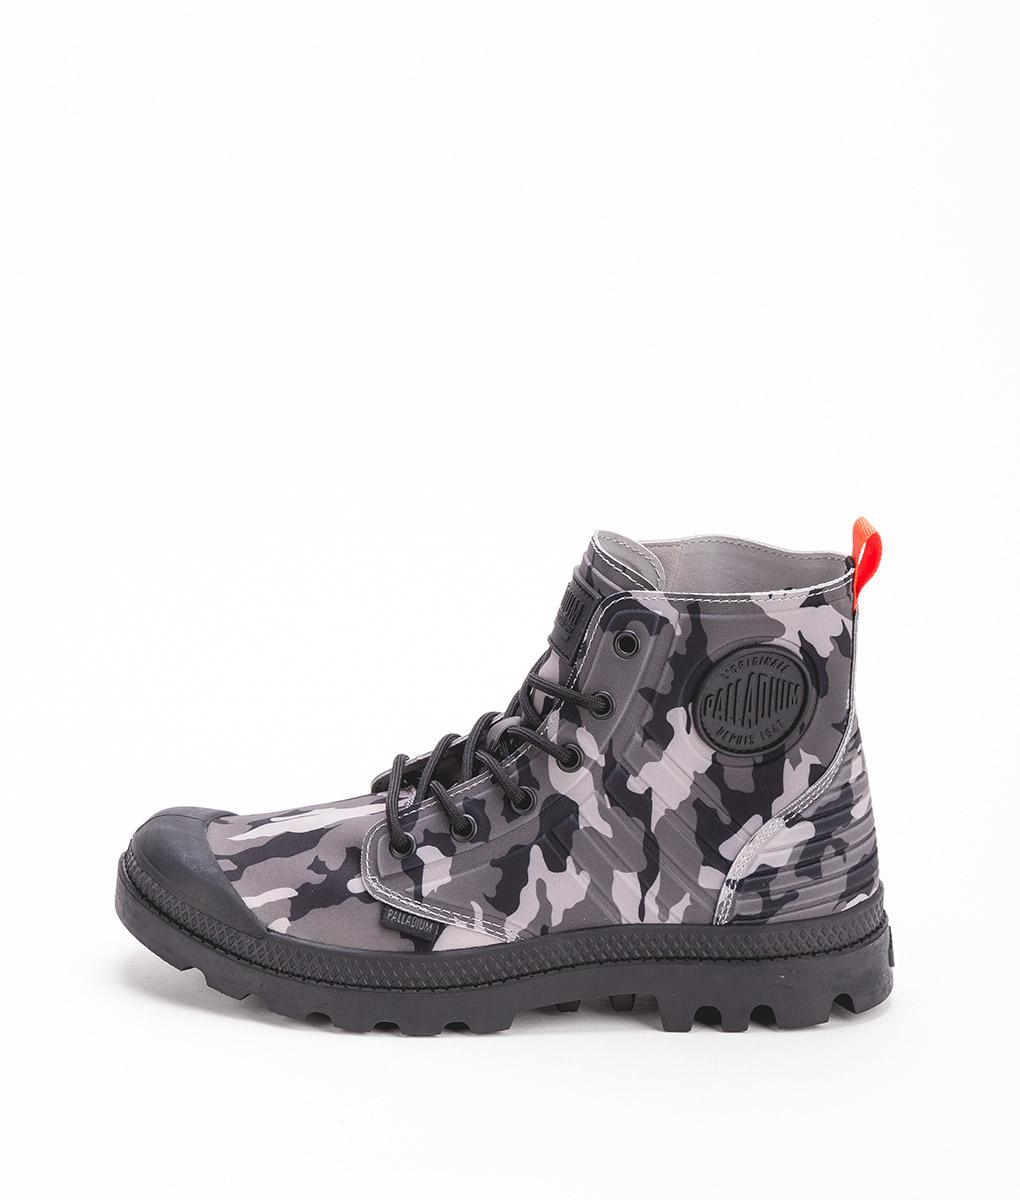 3189d28dfe1 PALLADIUM Men Sneakers 75987 PAMPA APHIBIAN CAMO TEXTILE, Black Camo Grey  109.99